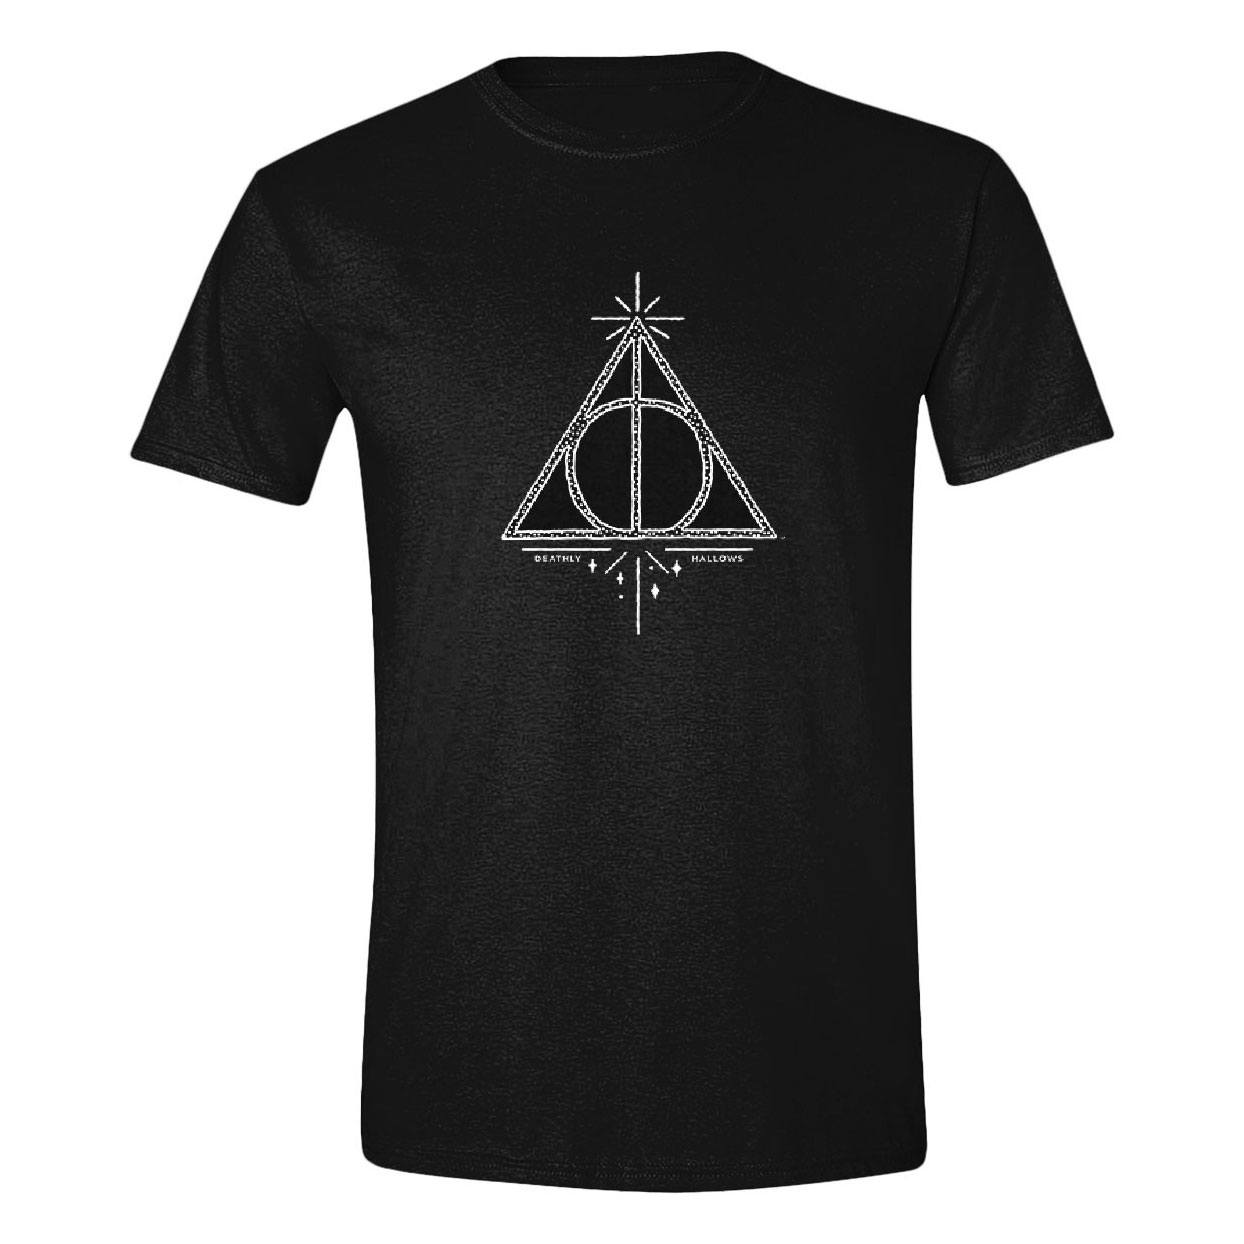 Harry Potter T-Shirt Deathly Hallows Symbol Size M